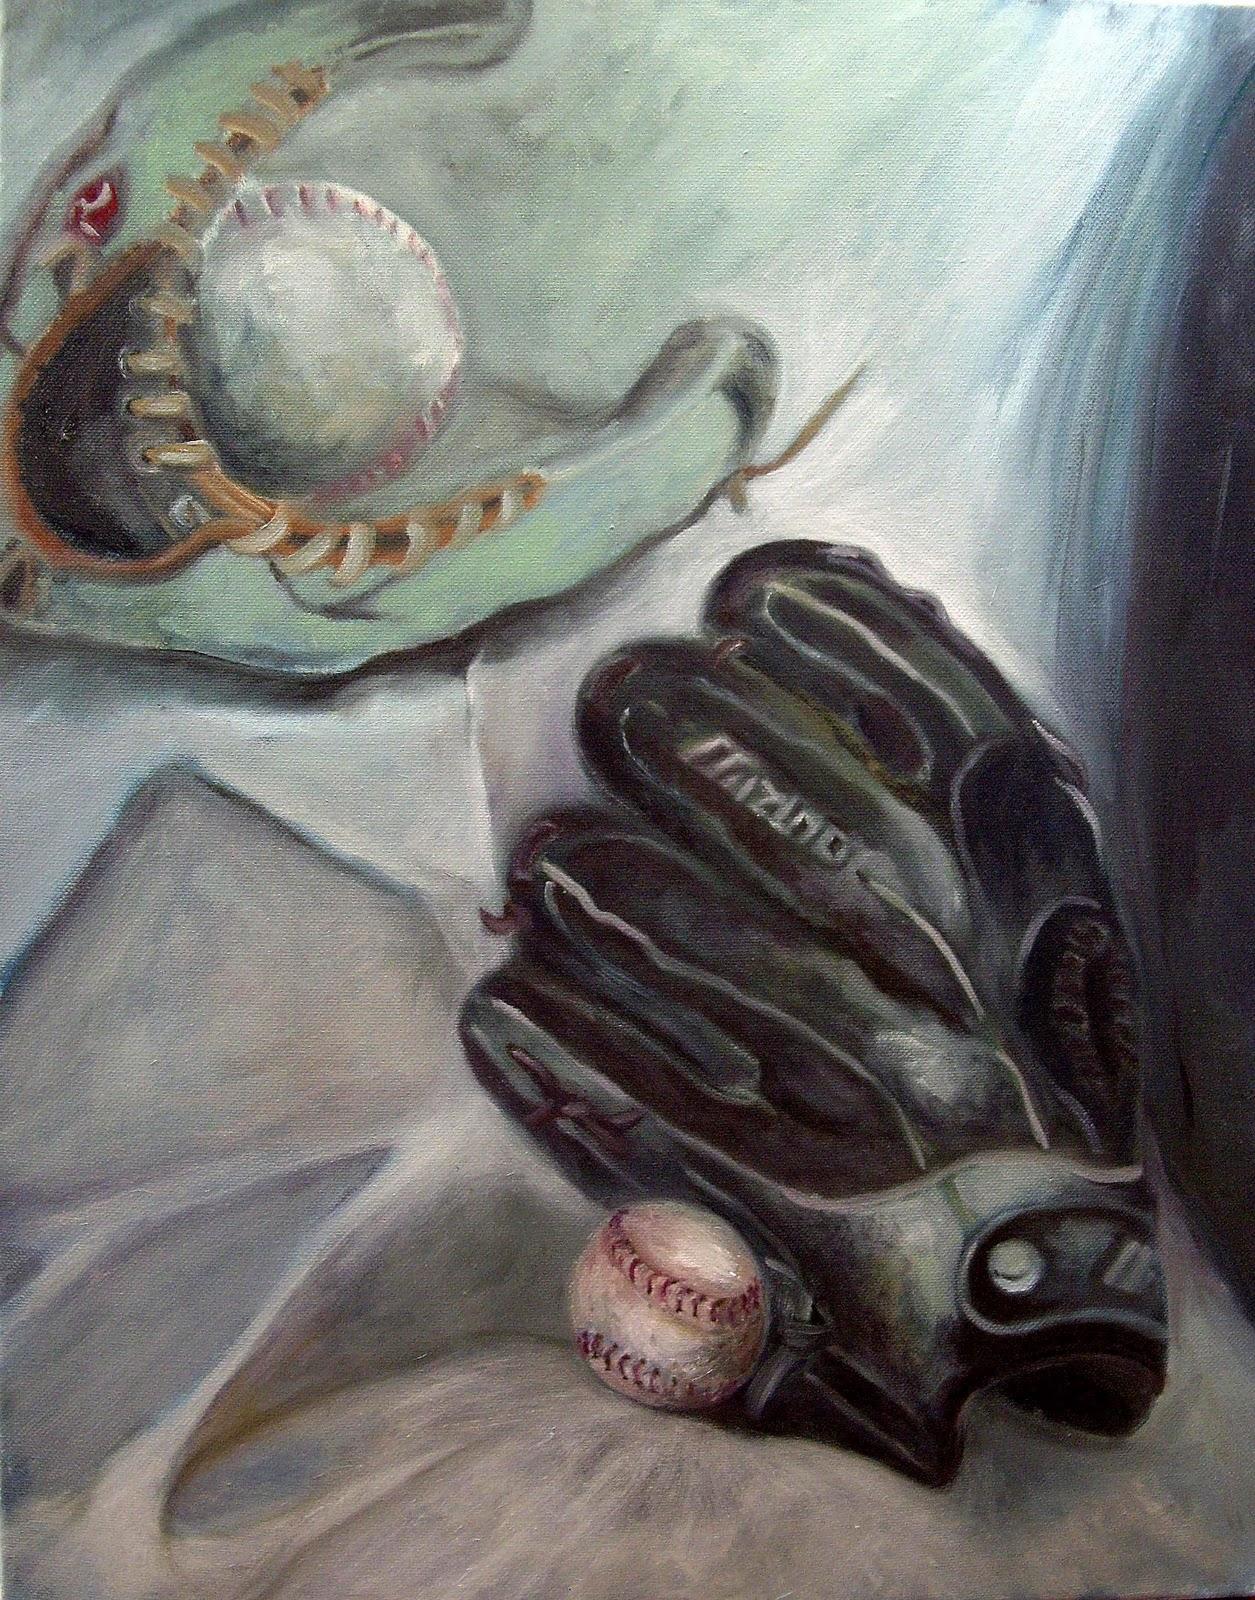 Baseball Glove Paint : My oil painting journey baseball glove